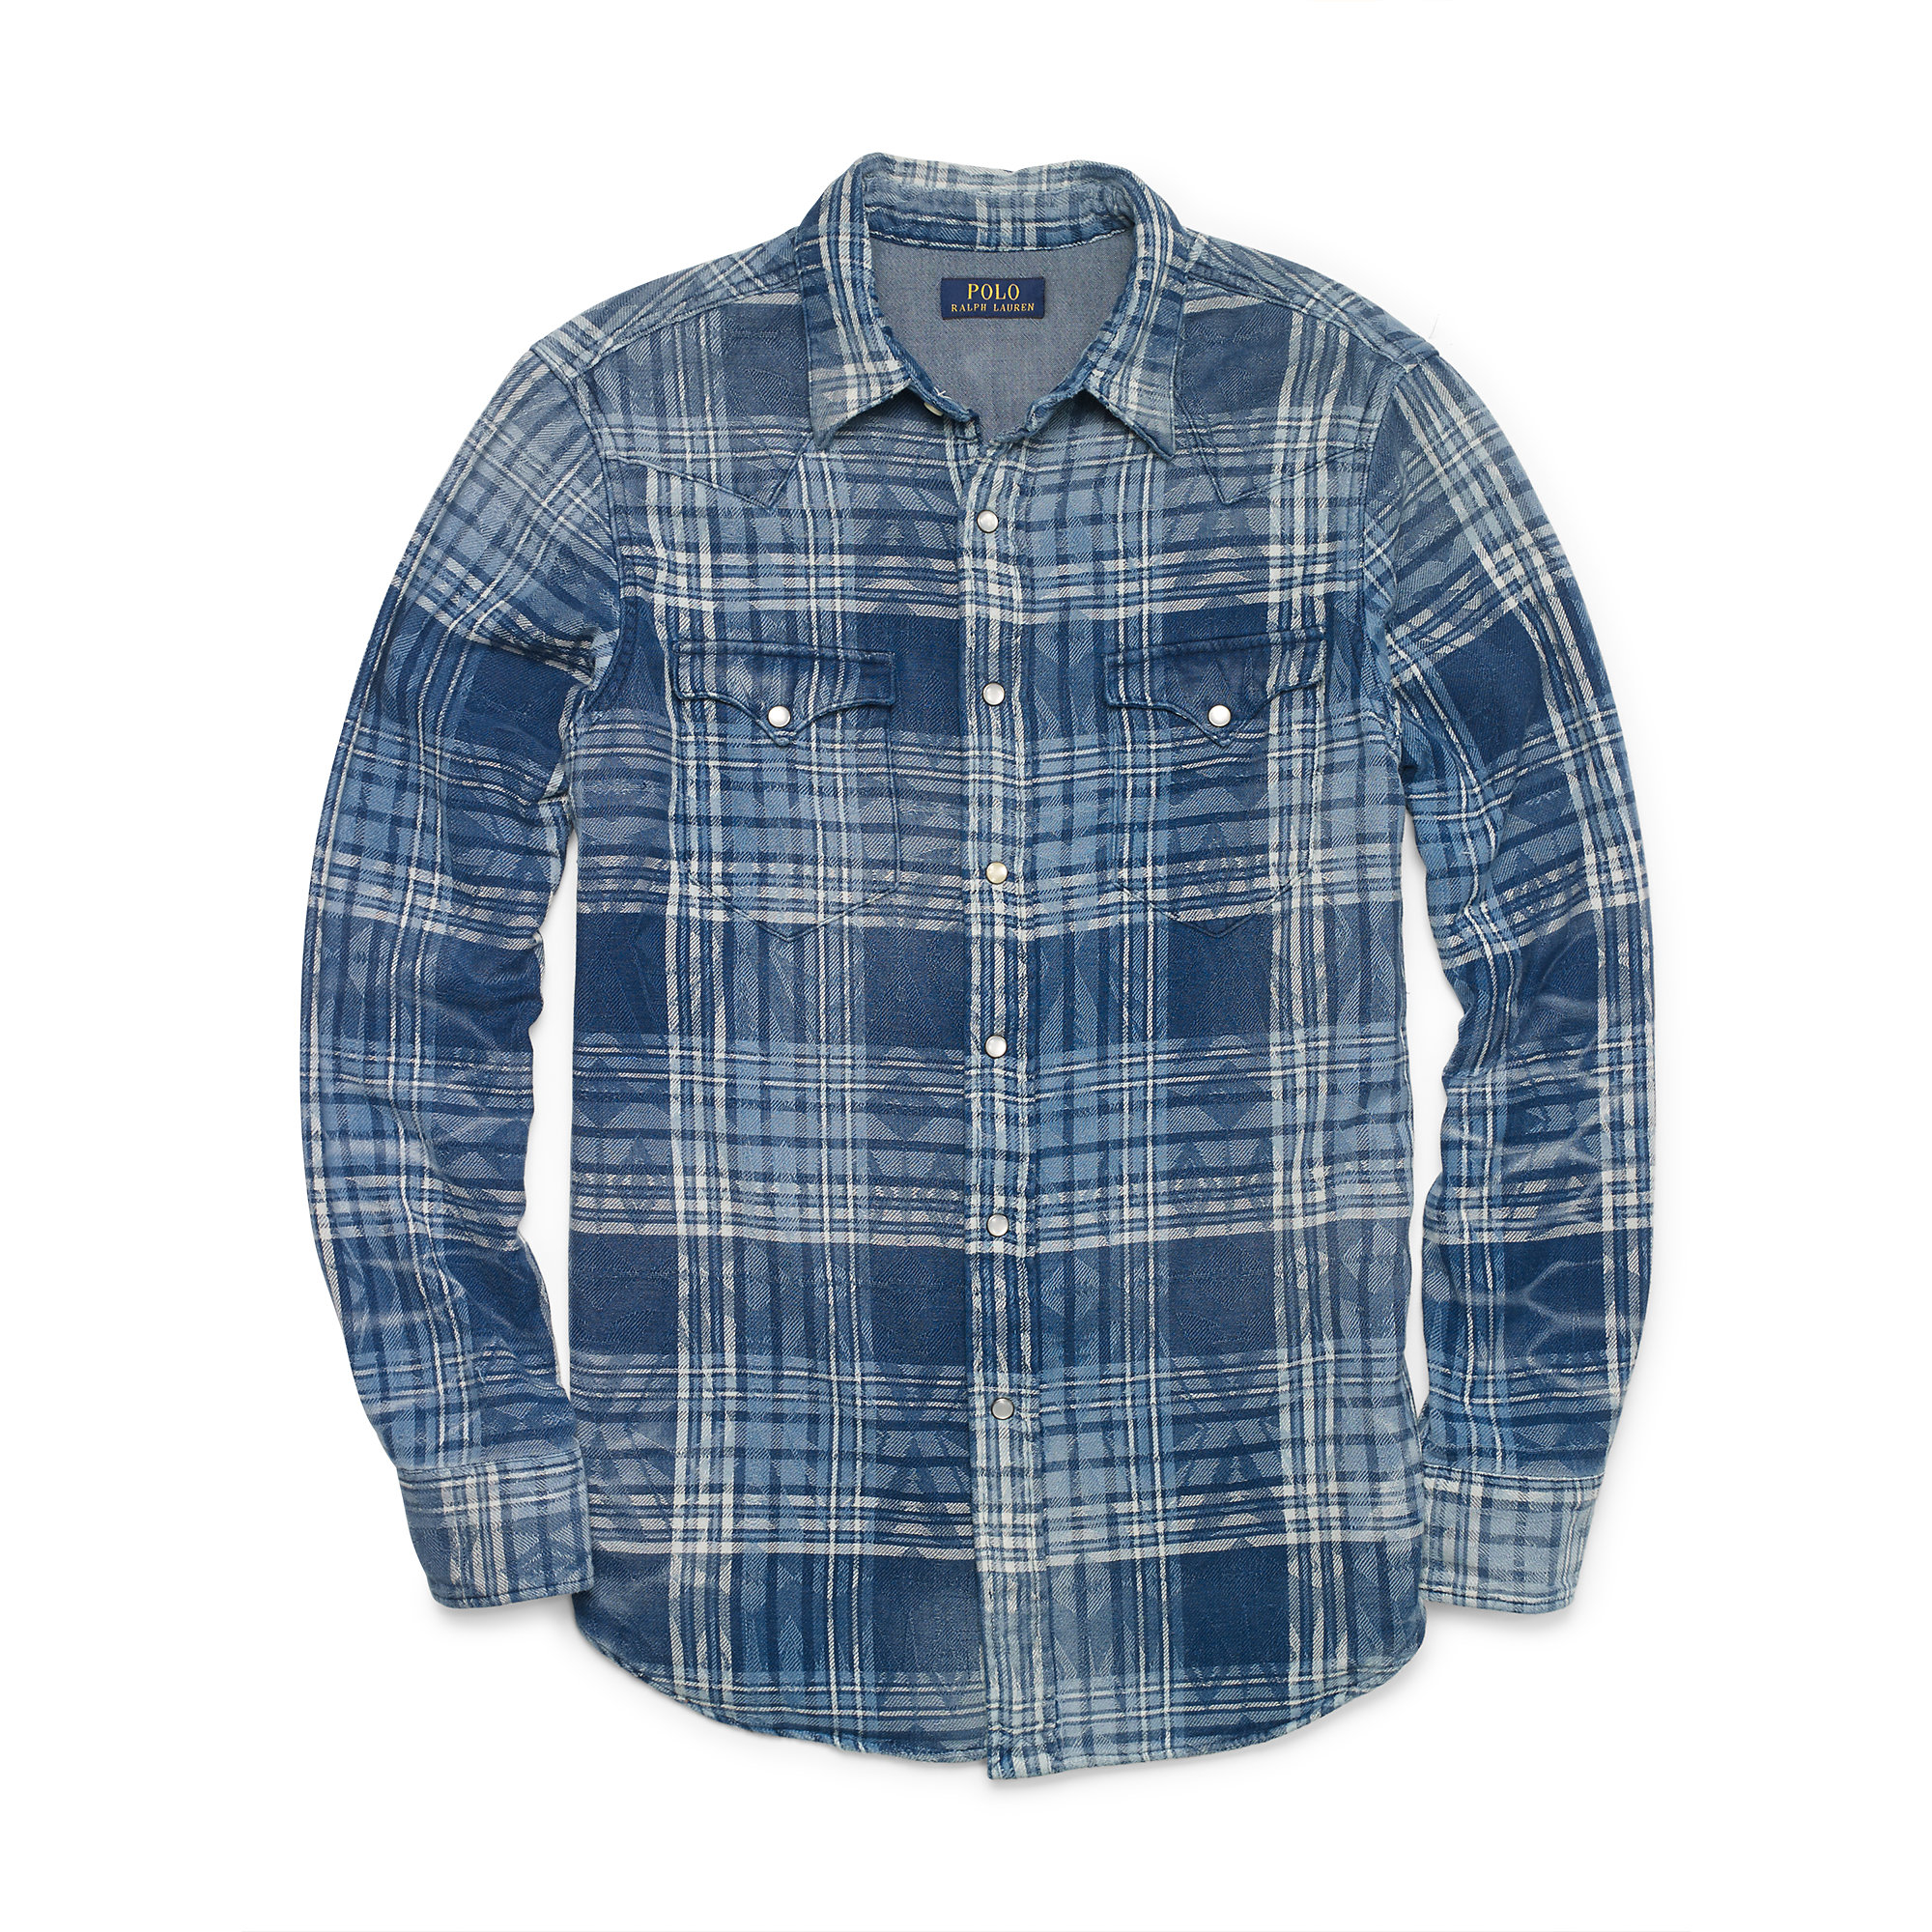 Lyst Polo Ralph Lauren Indigo Plaid Western Shirt In